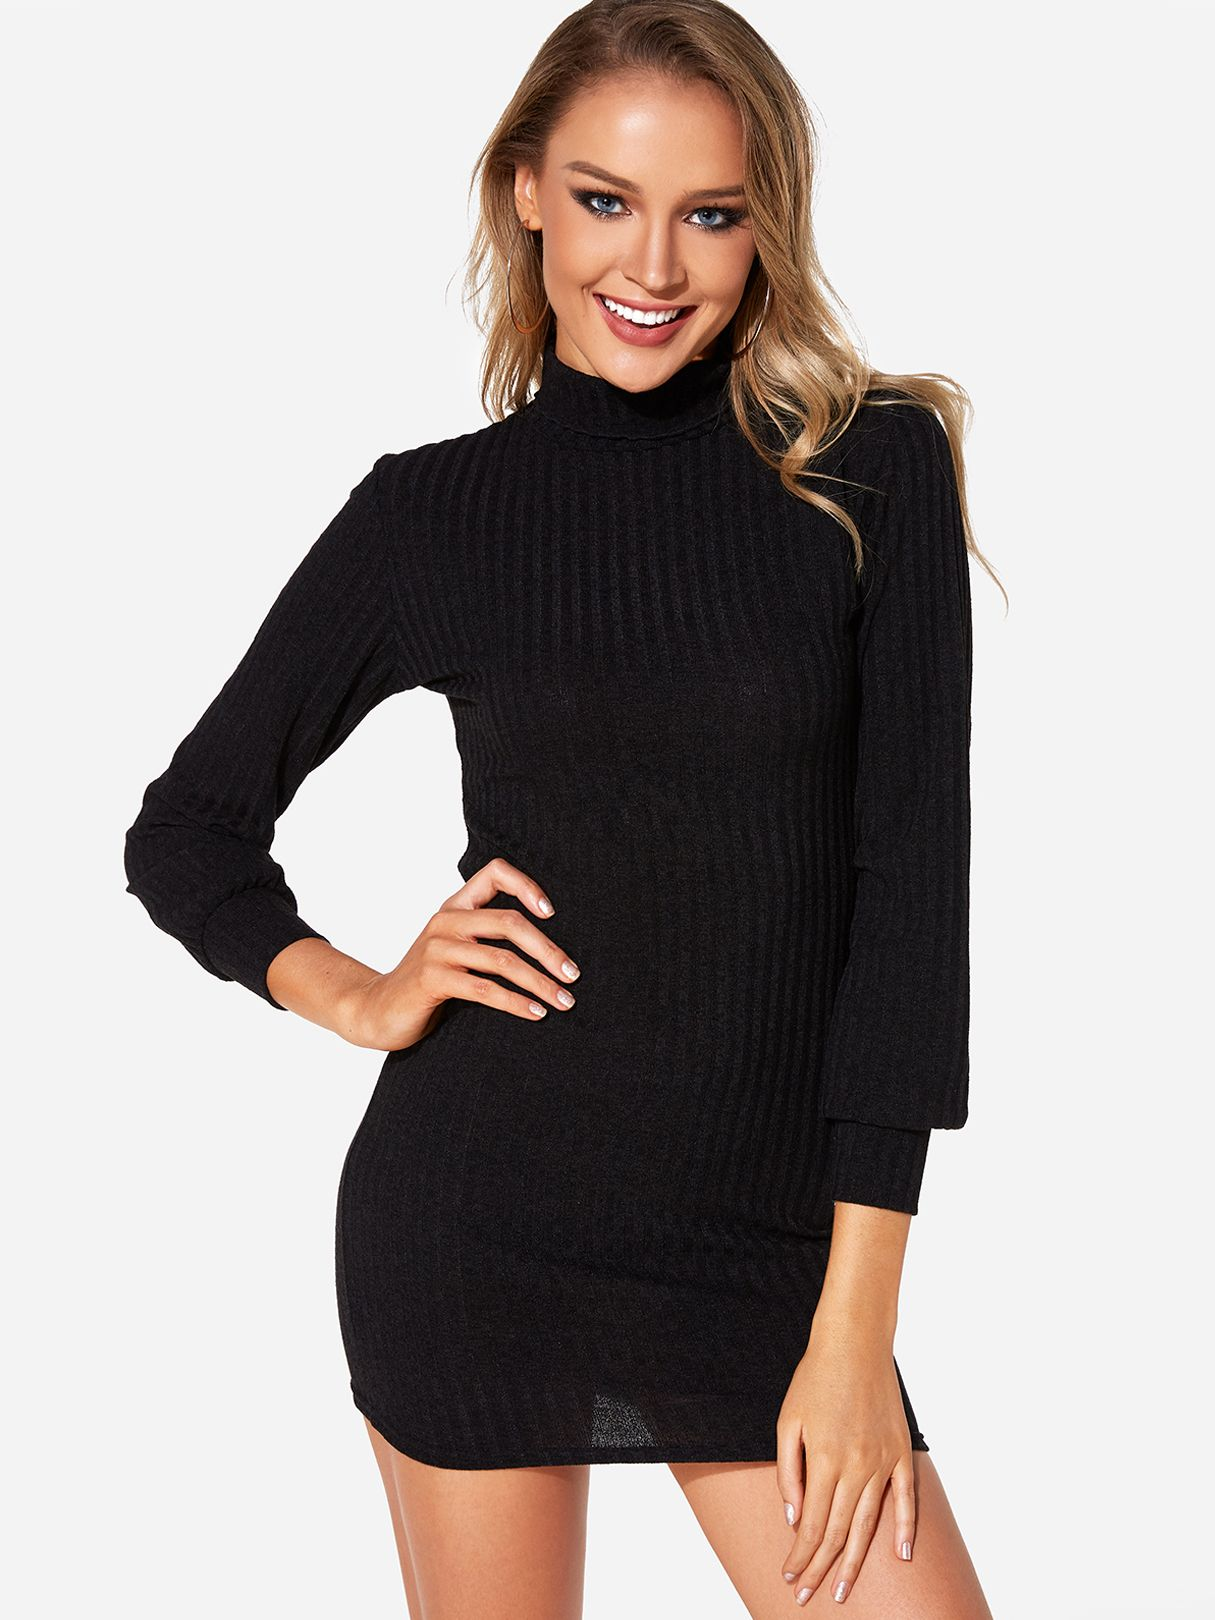 Black Plain Turtleneck Long Sleeves Sweater Dress - US 12.01 in 2019 ... 6518f4628